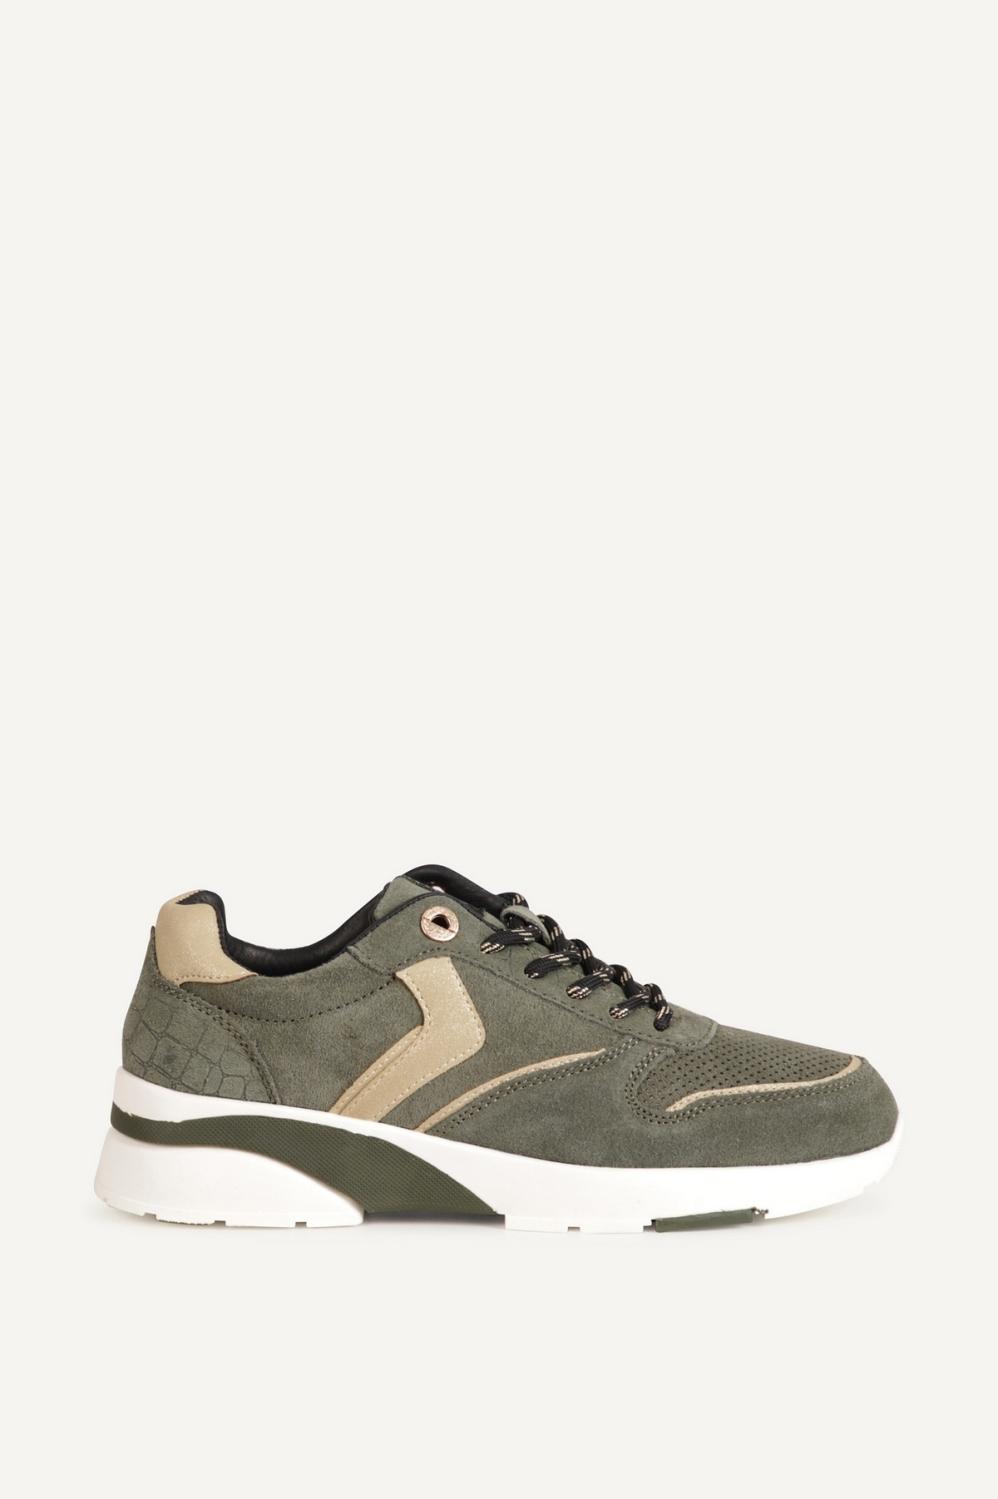 Shoecolate Sneaker Groen 8.20.06.141